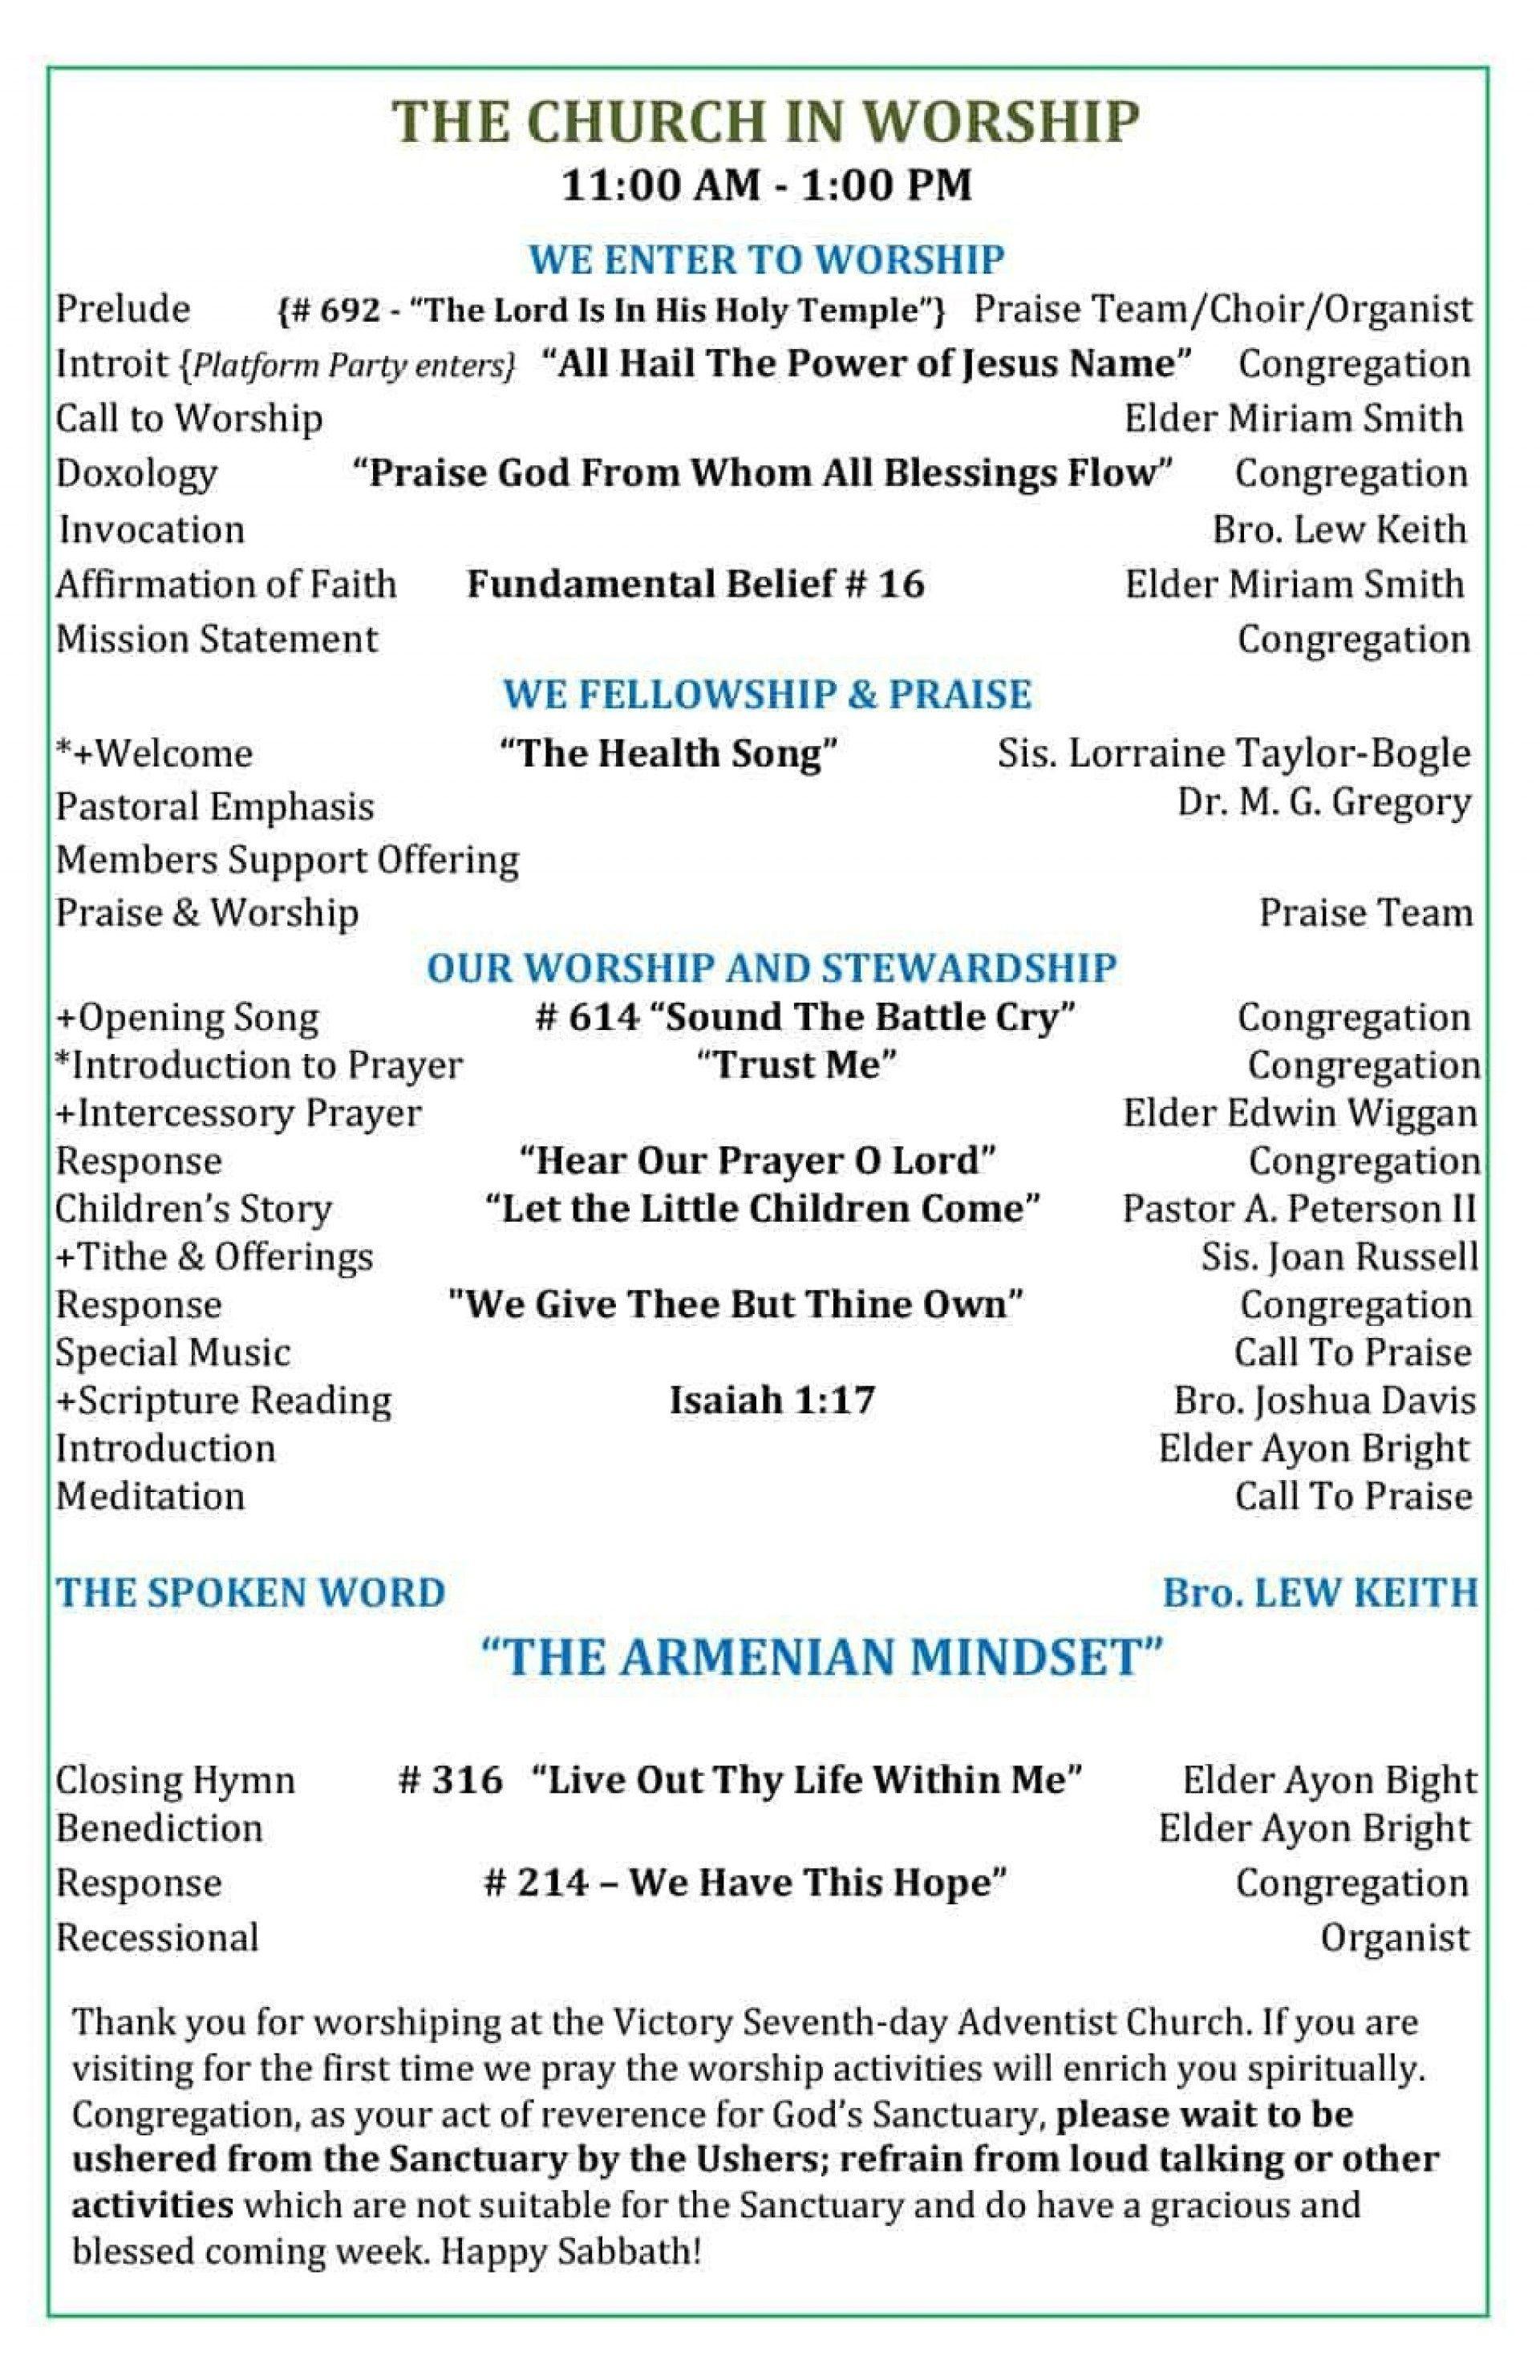 005 Fascinating Free Church Program Template Doc High Resolution 1920